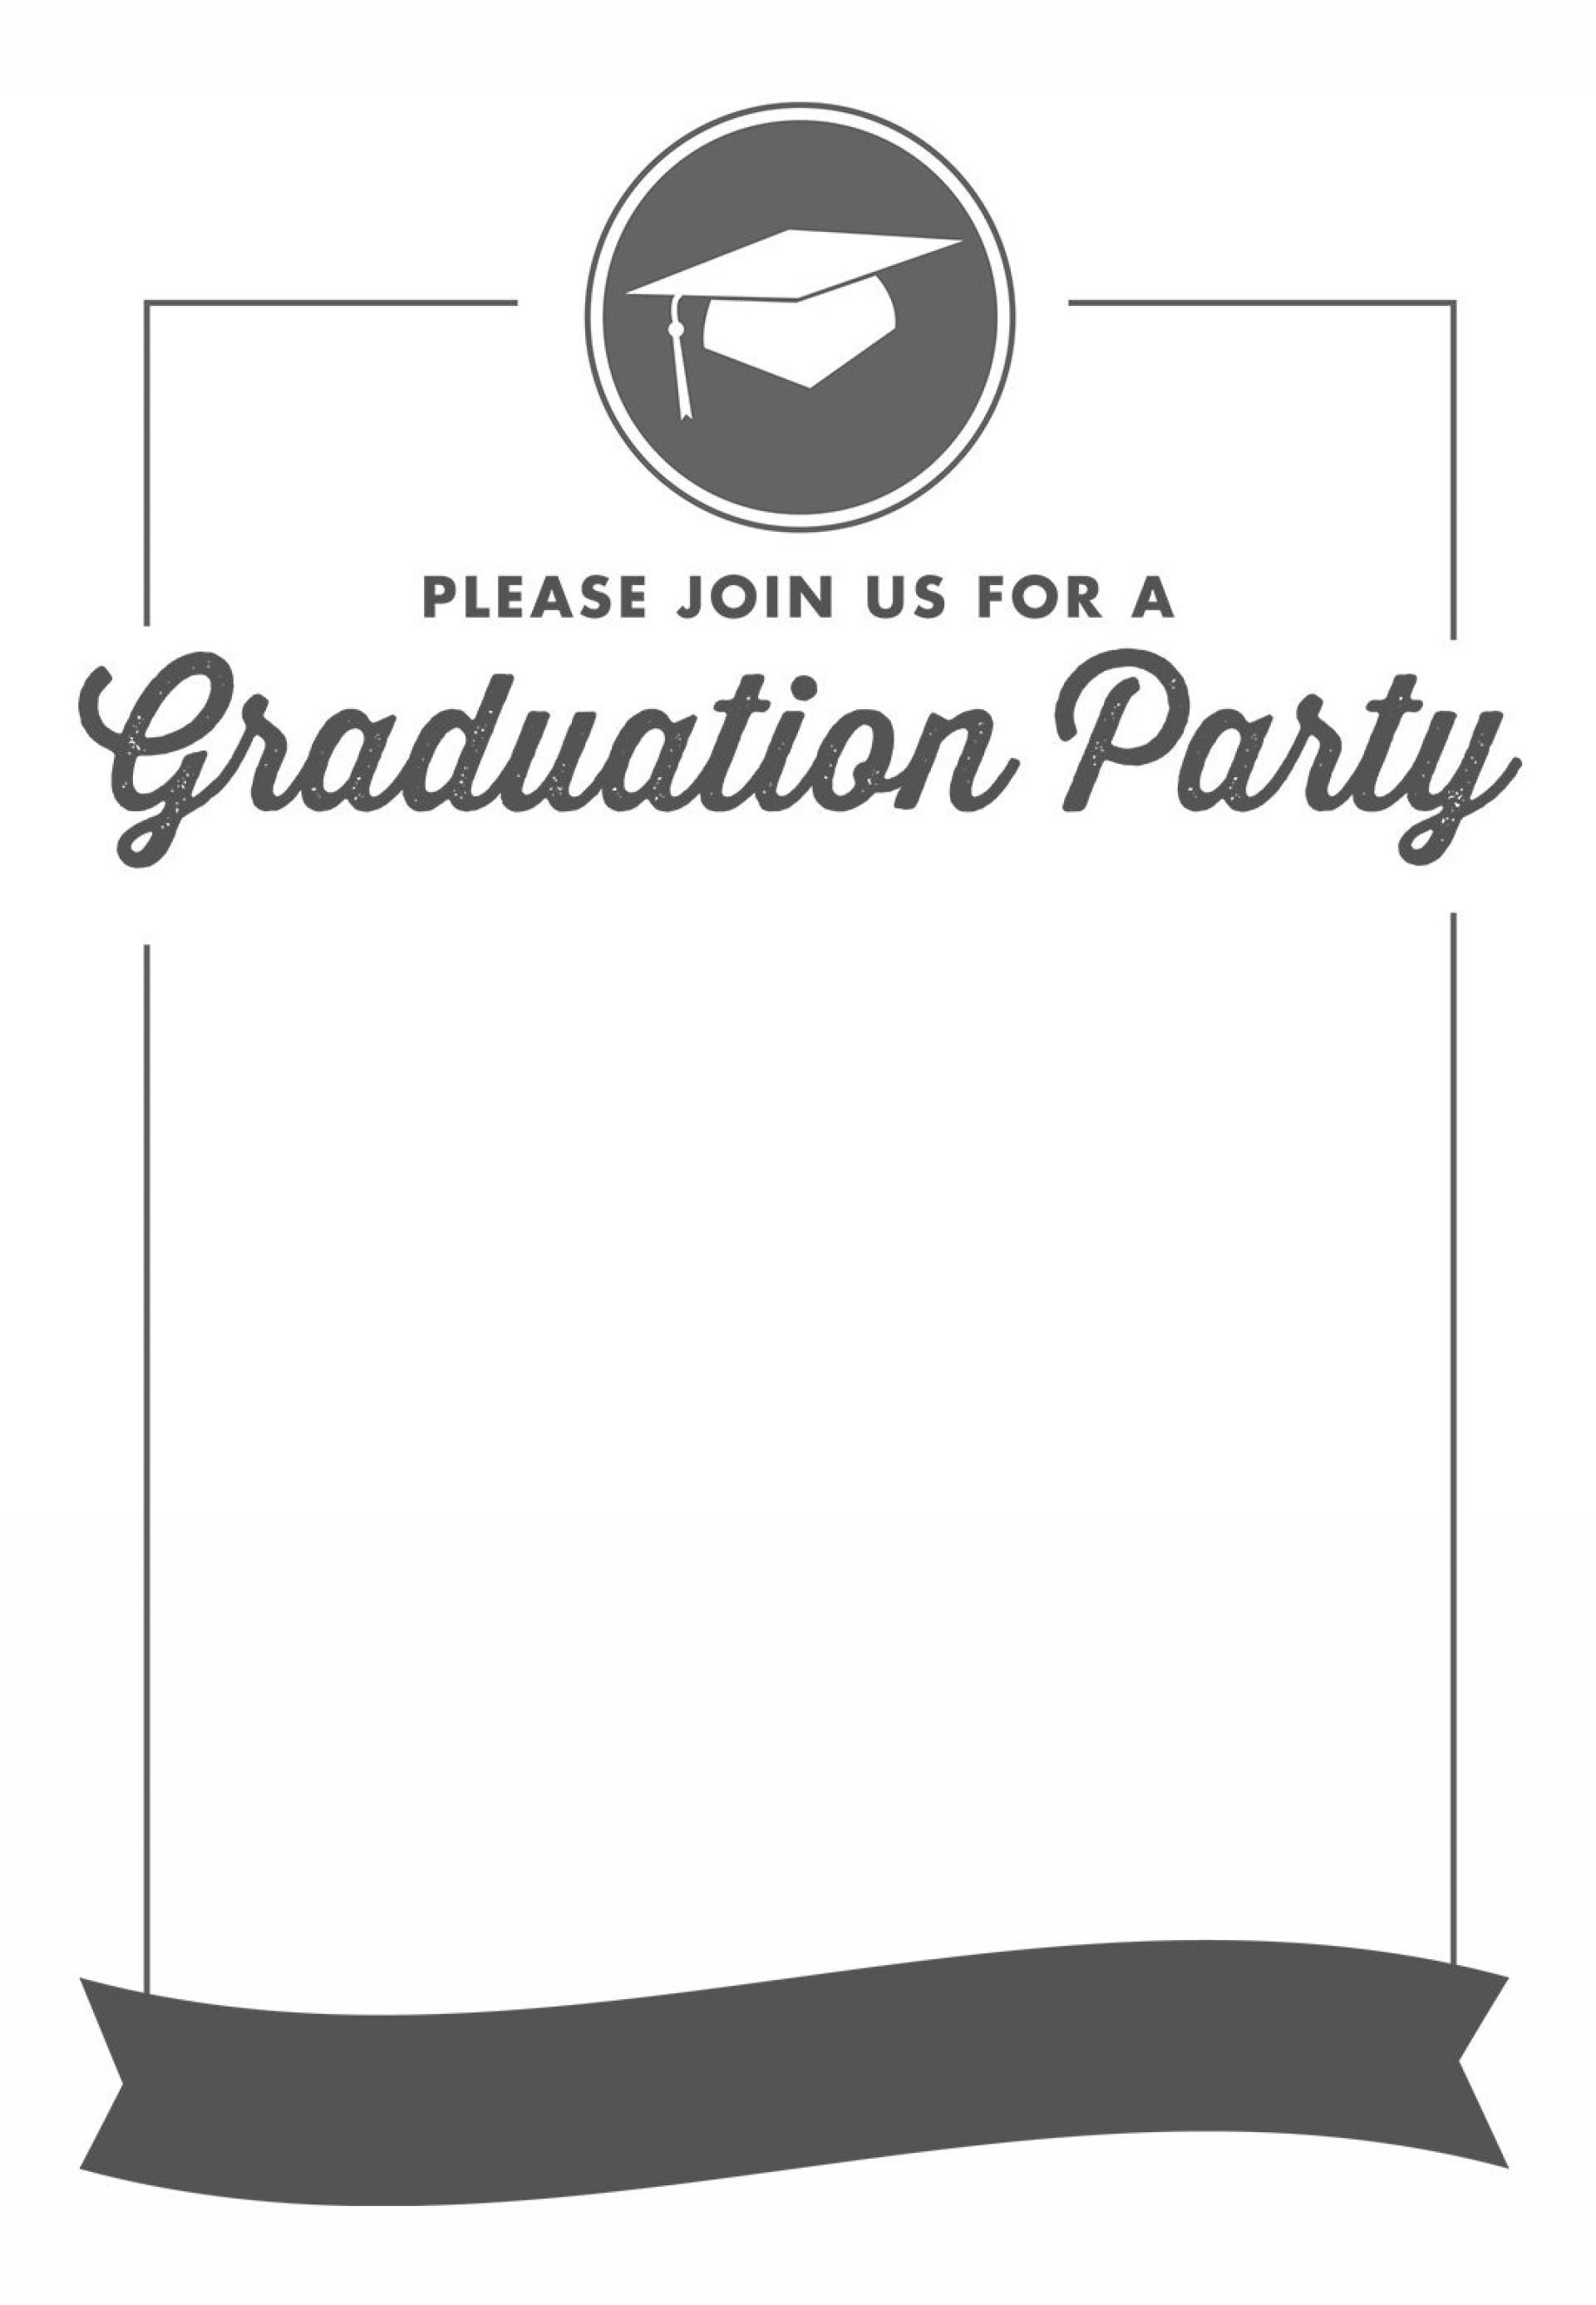 000 Sensational Graduation Party Invitation Template Example  Microsoft Word 4 Per Page1920